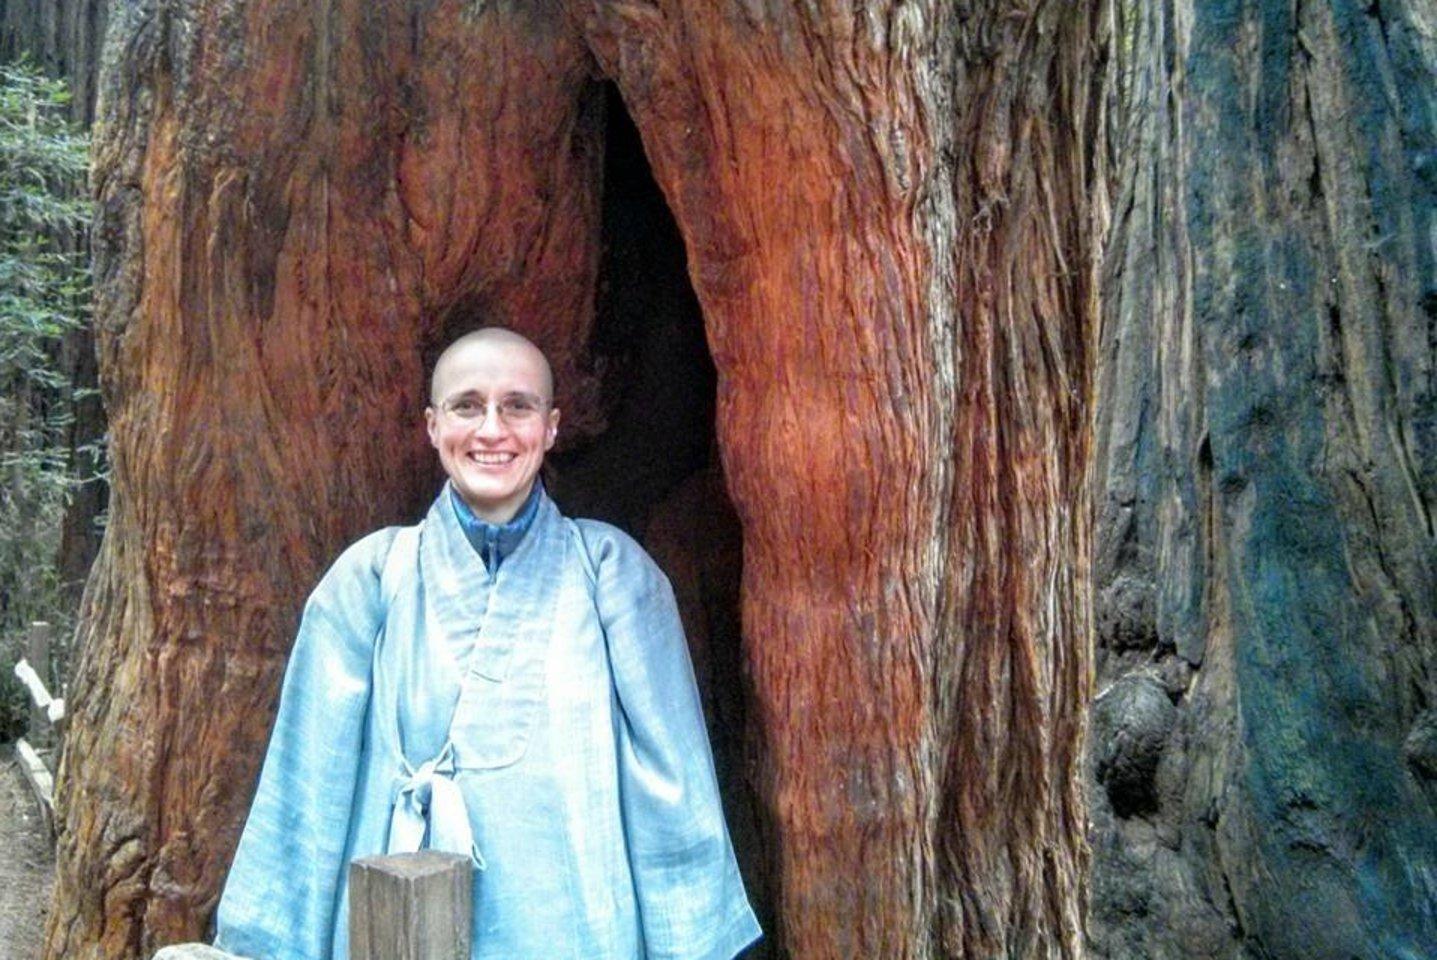 Pirmoji Lietuvoje Zen budizmo mokytoja Myong Hae Sunim (Loreta Kairytė) žuvo autoavarijoje prie Plungės.<br>Kwan Um Zen mokyklos nuotr.